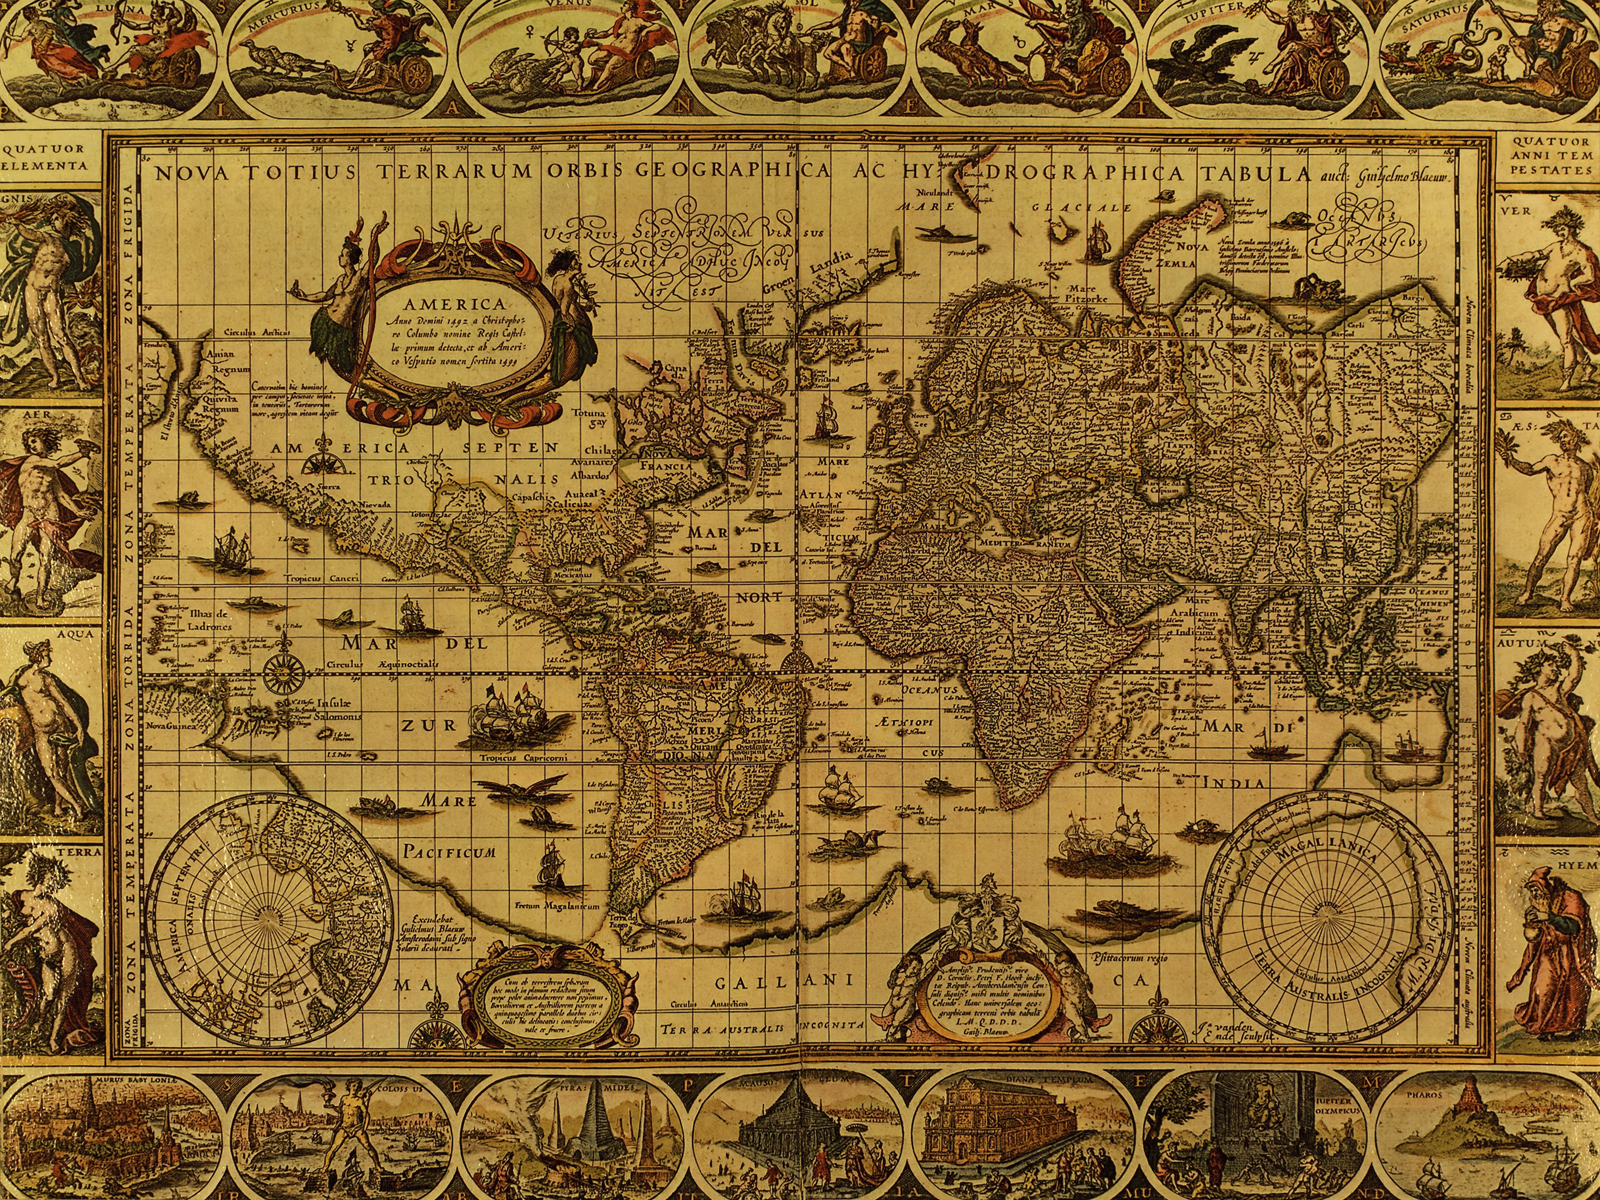 DREAM WALLPAPER Antique Map Wallpaper 1600x1200